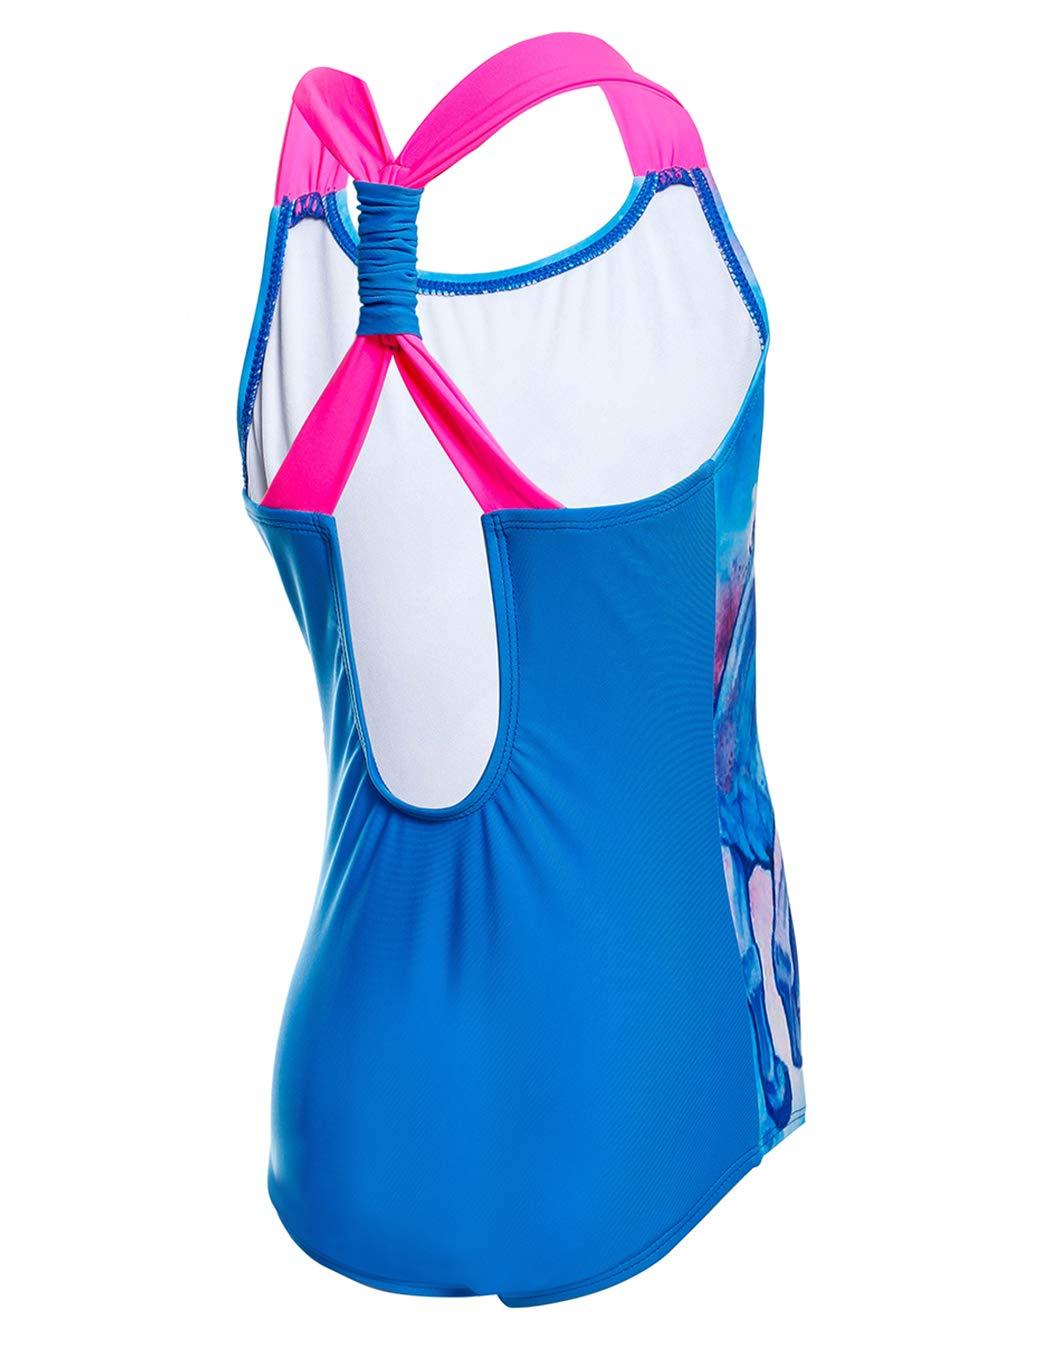 One Piece Swimsuit Ruffle Back Bathing Suit iDrawl Swimwear for Girls